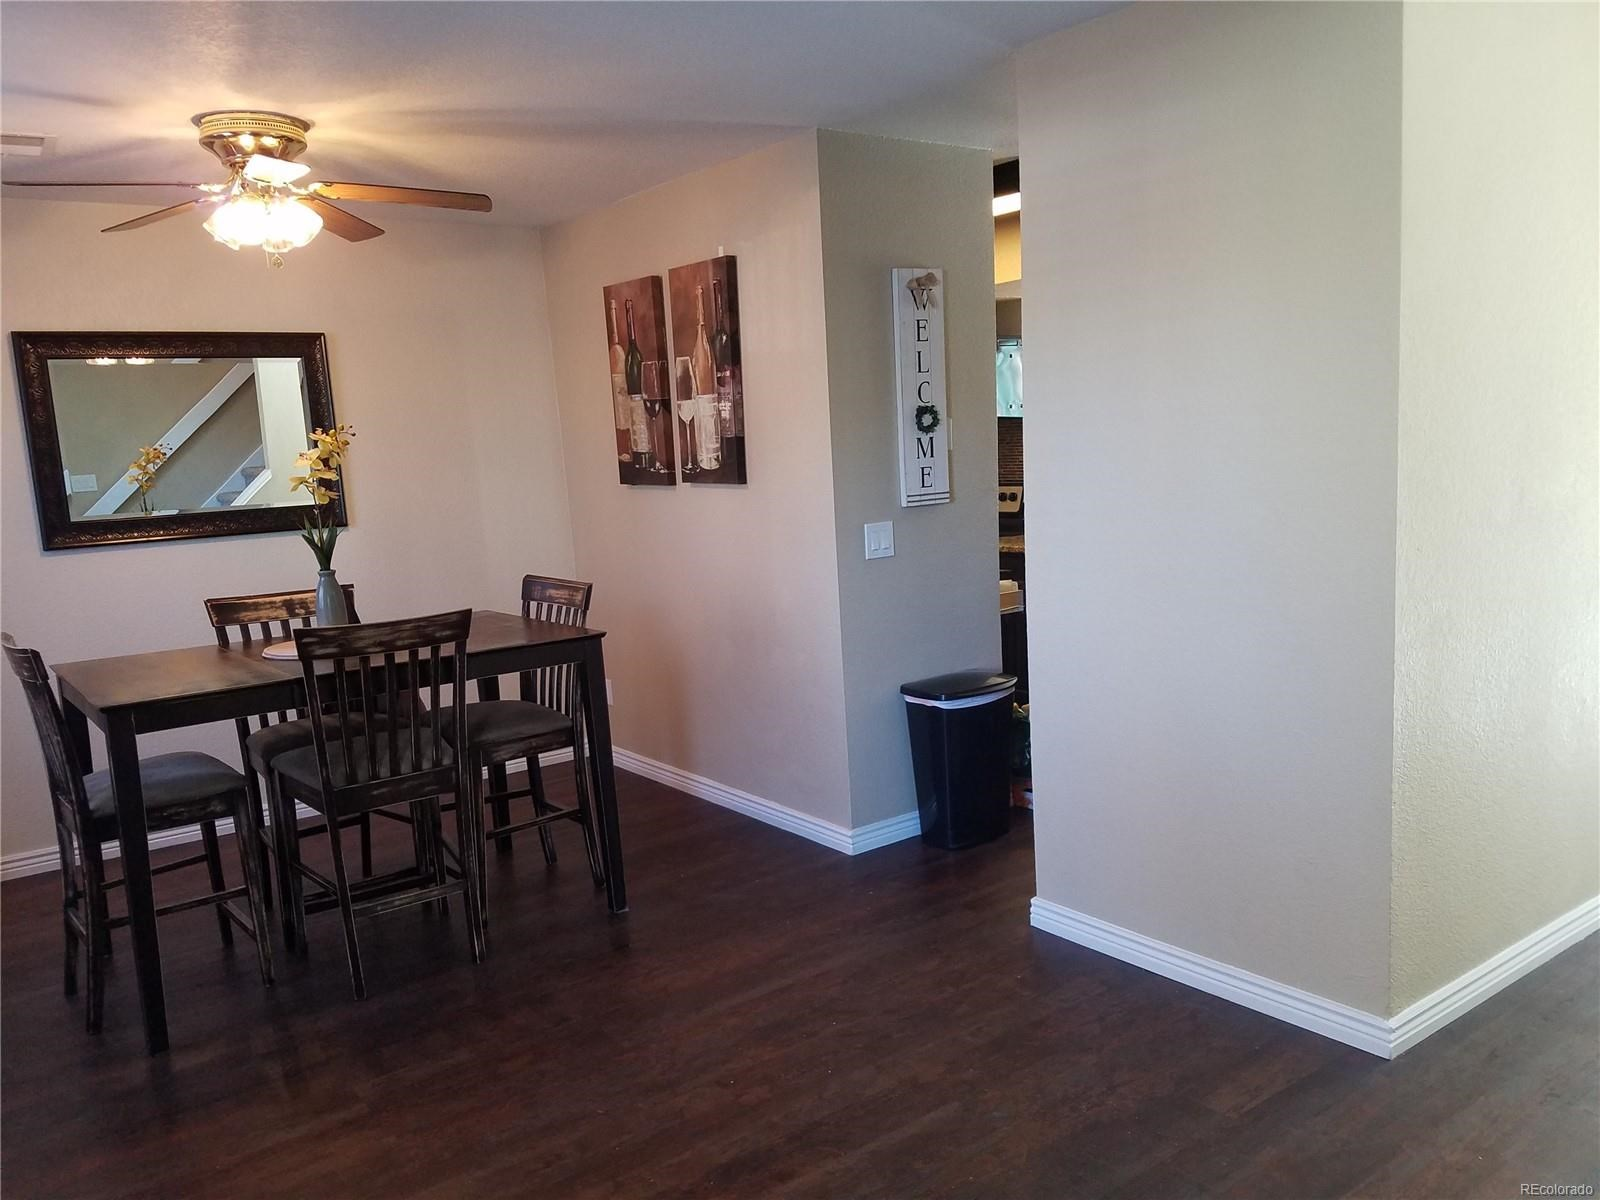 MLS# 6878459 - 4 - 12162 E Kepner Place, Aurora, CO 80012